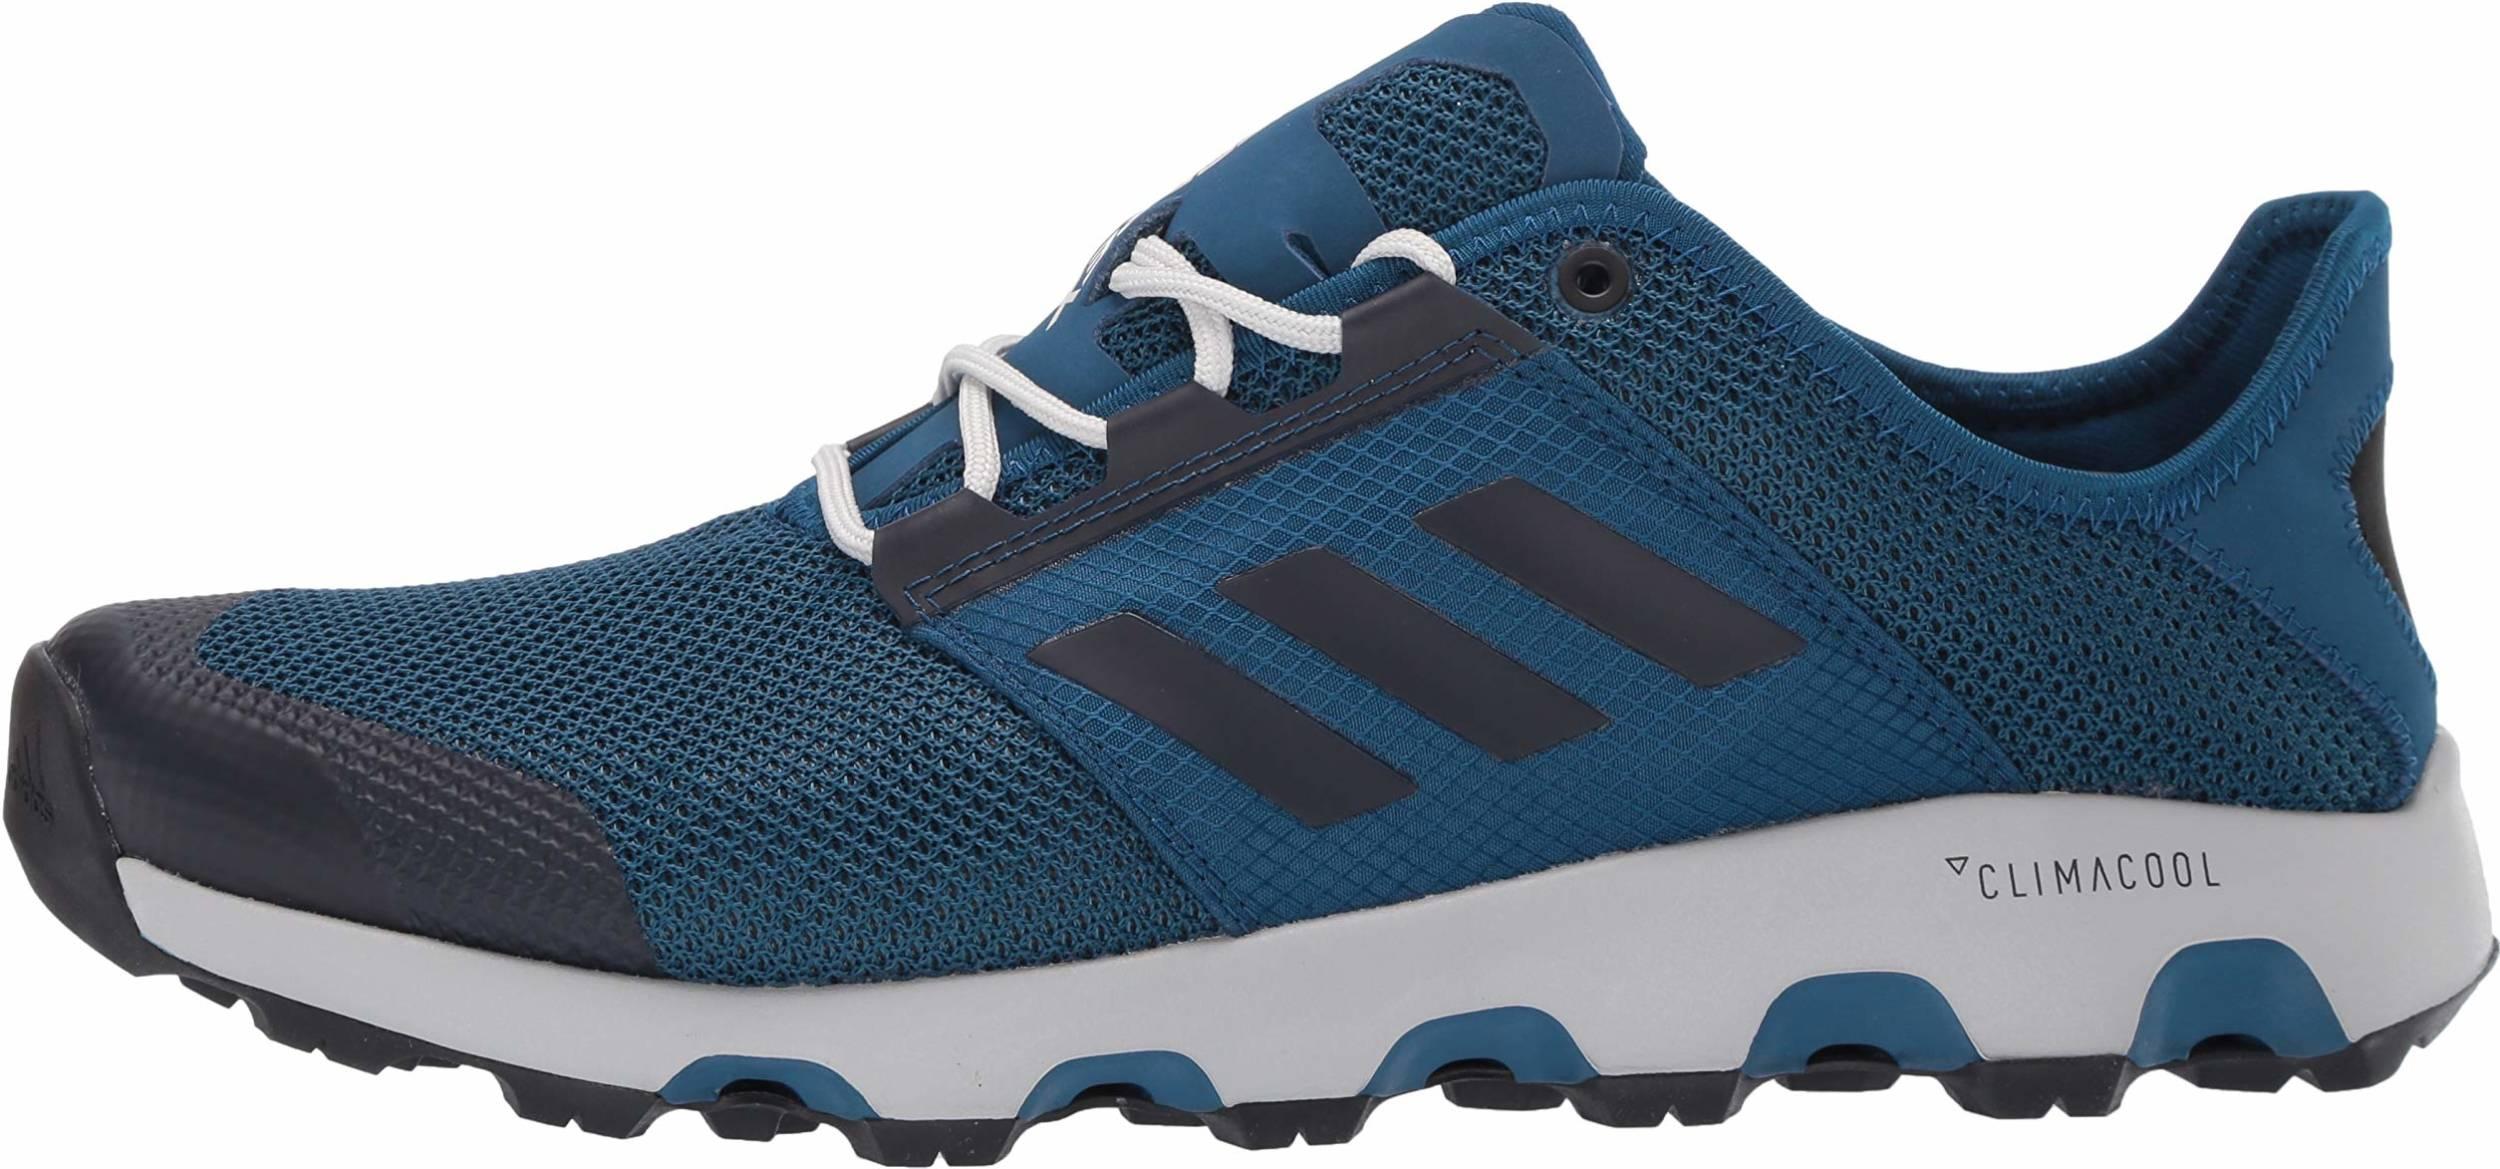 adidas terex shoes